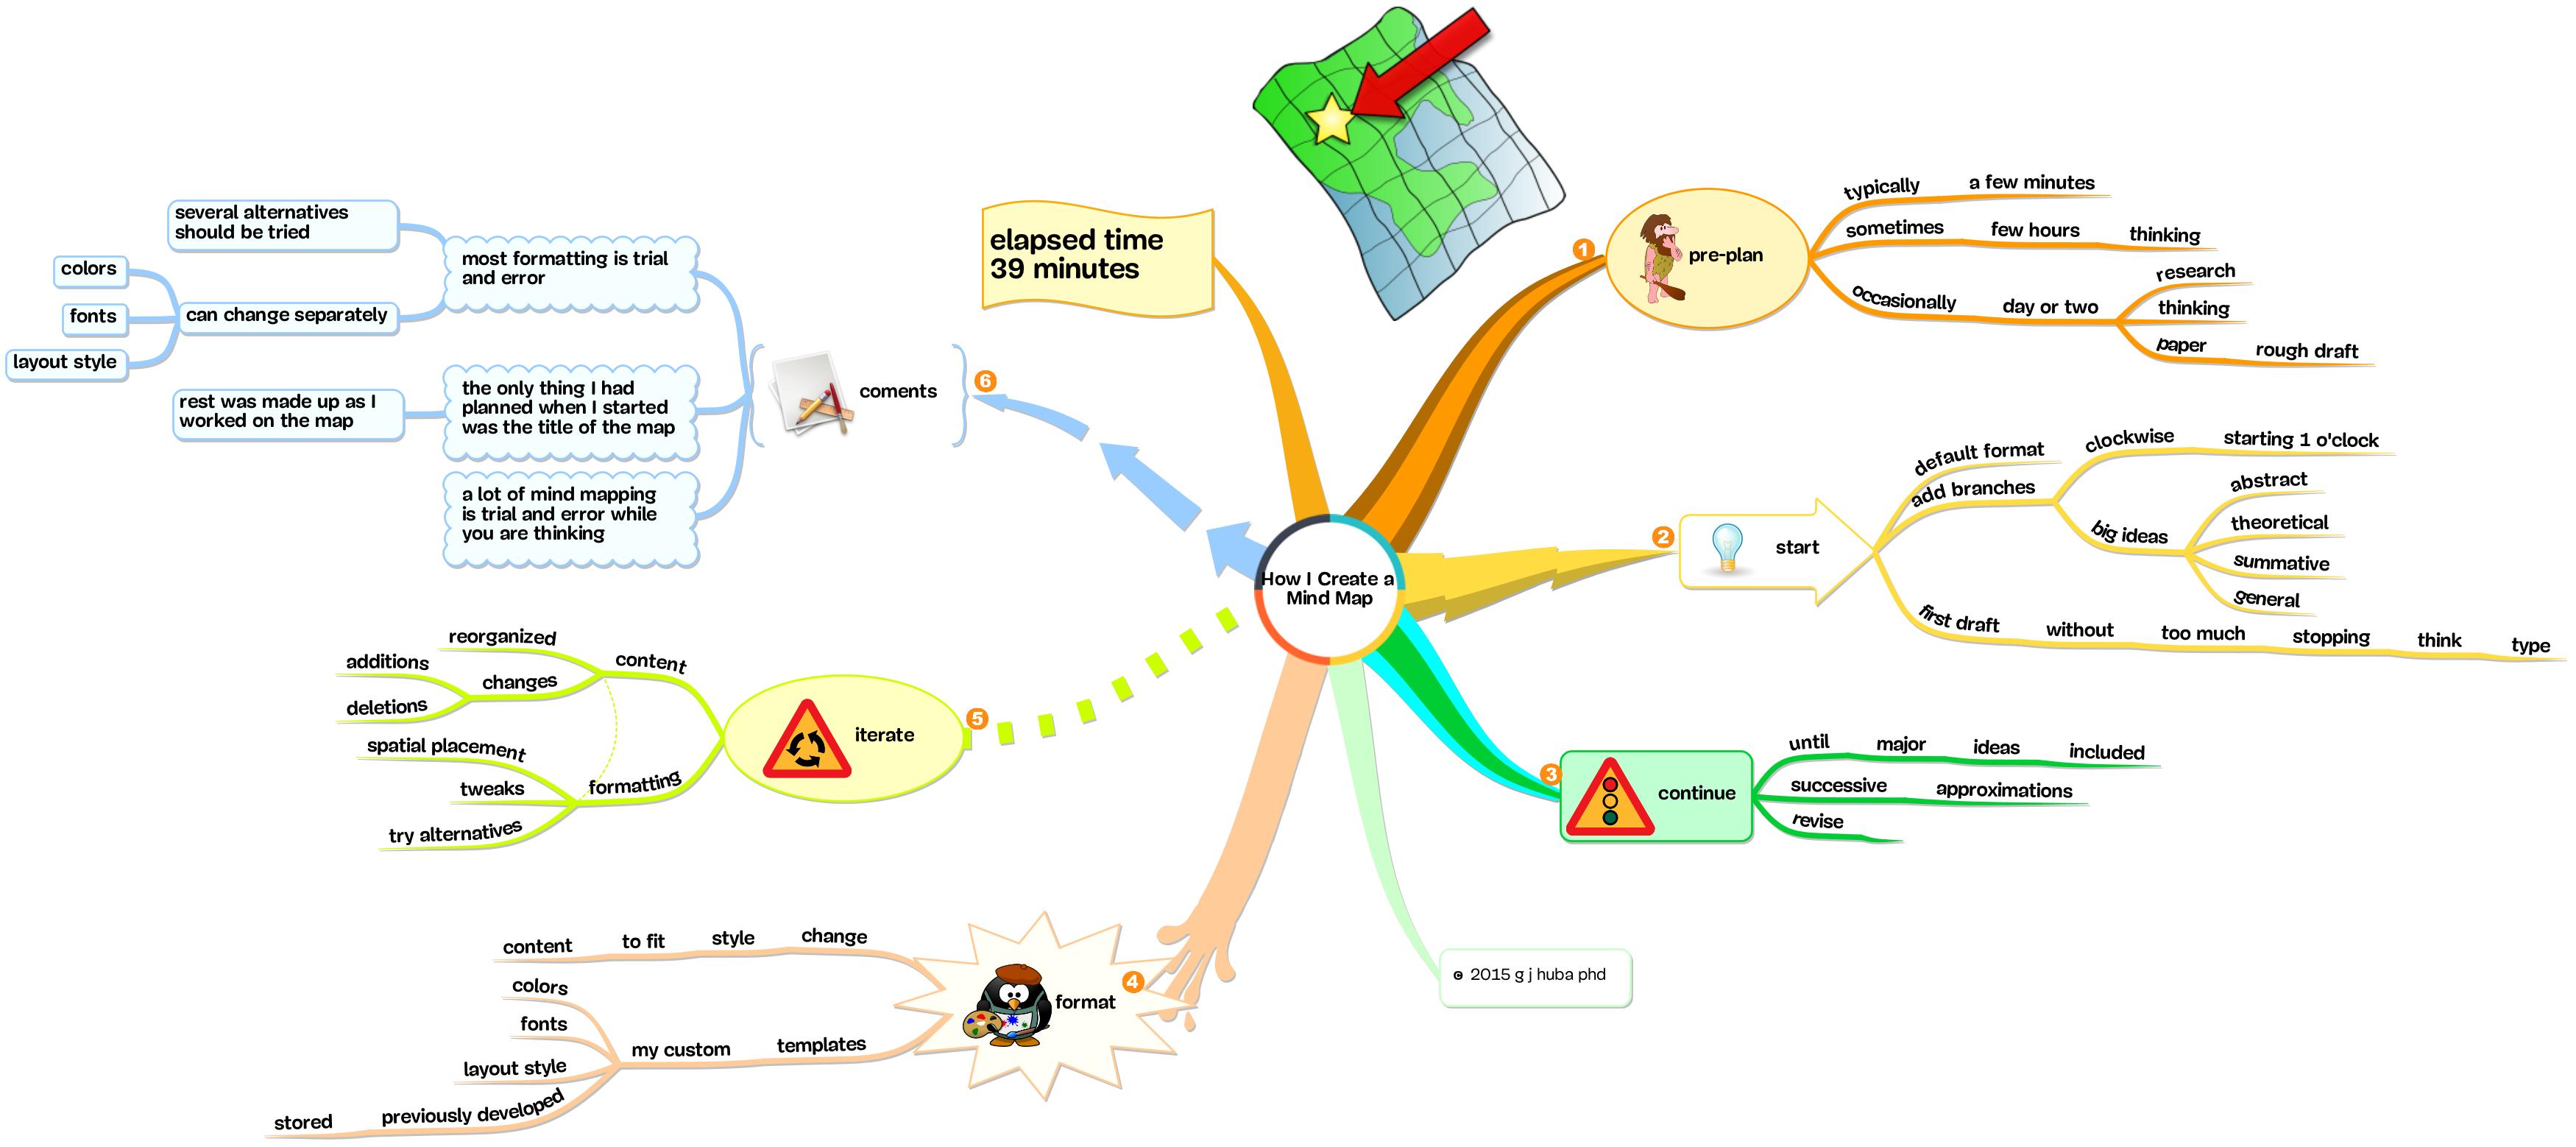 How I Create a Mind Map